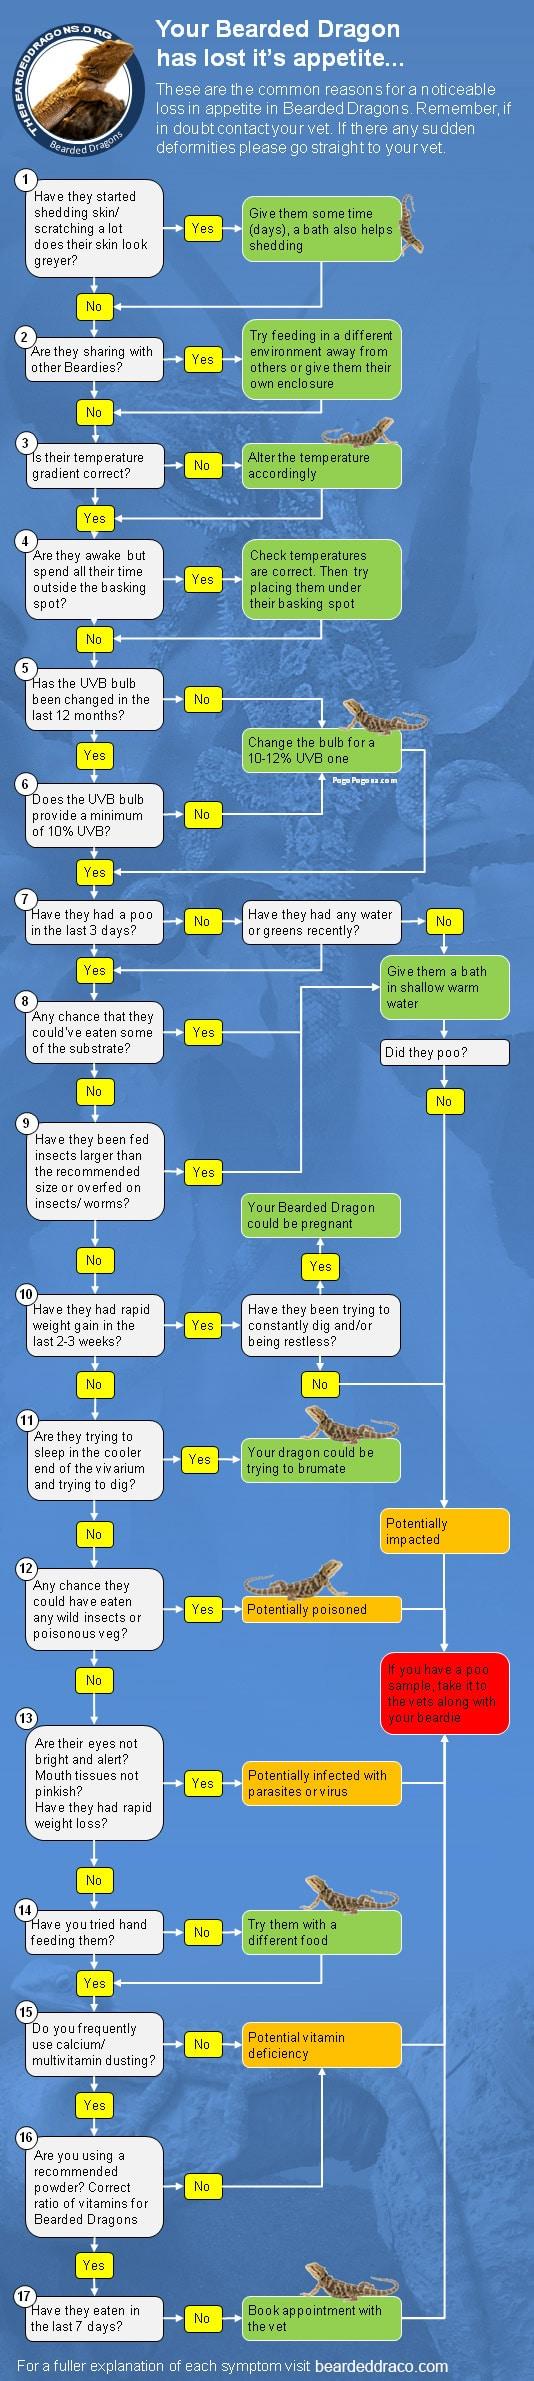 bearded-dragon-loss-of-appetite-flow-chart